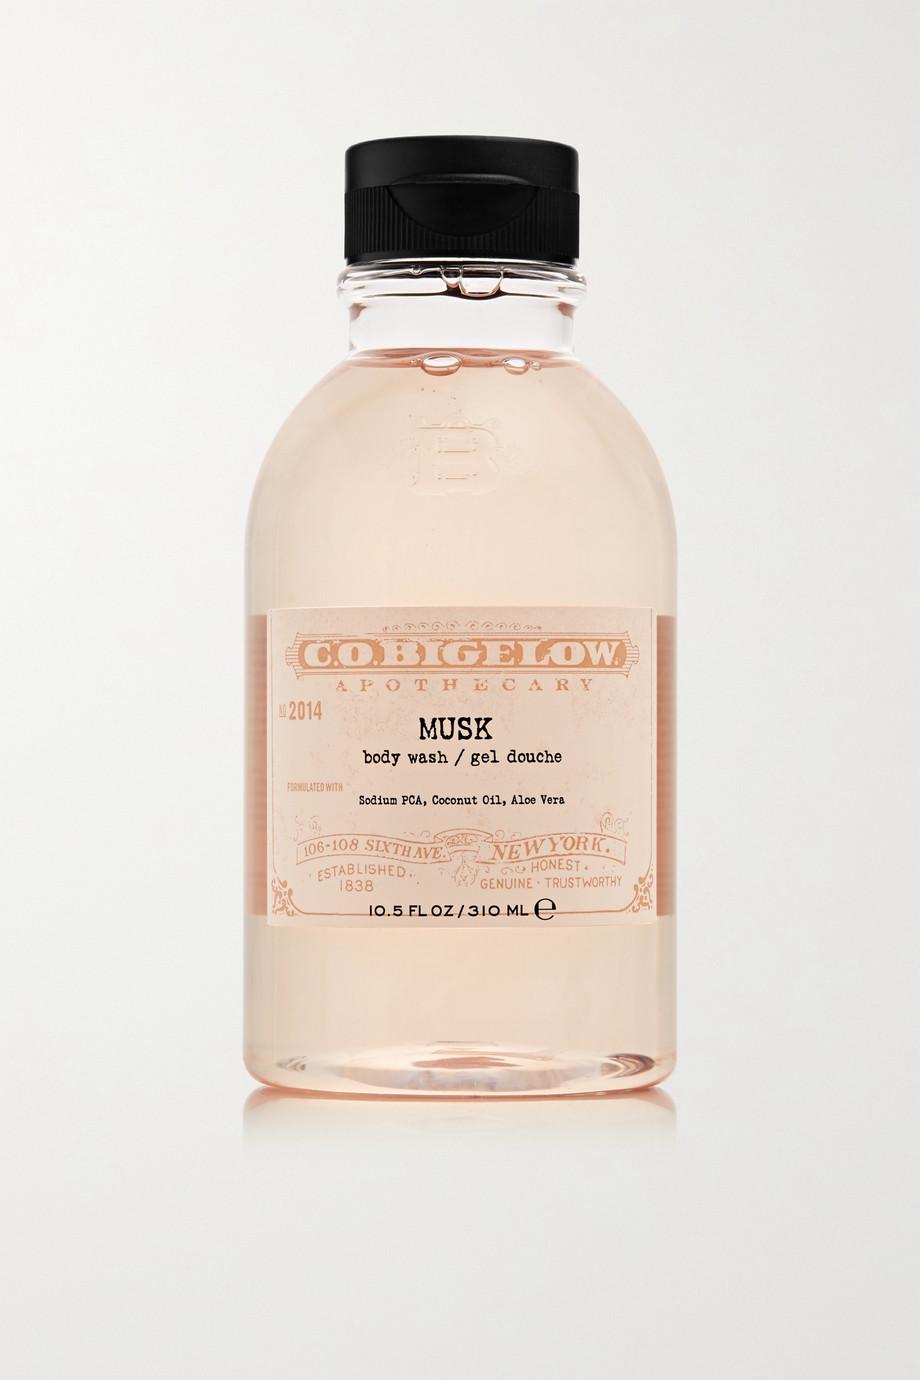 C.O. Bigelow Musk Body Wash, 310ml